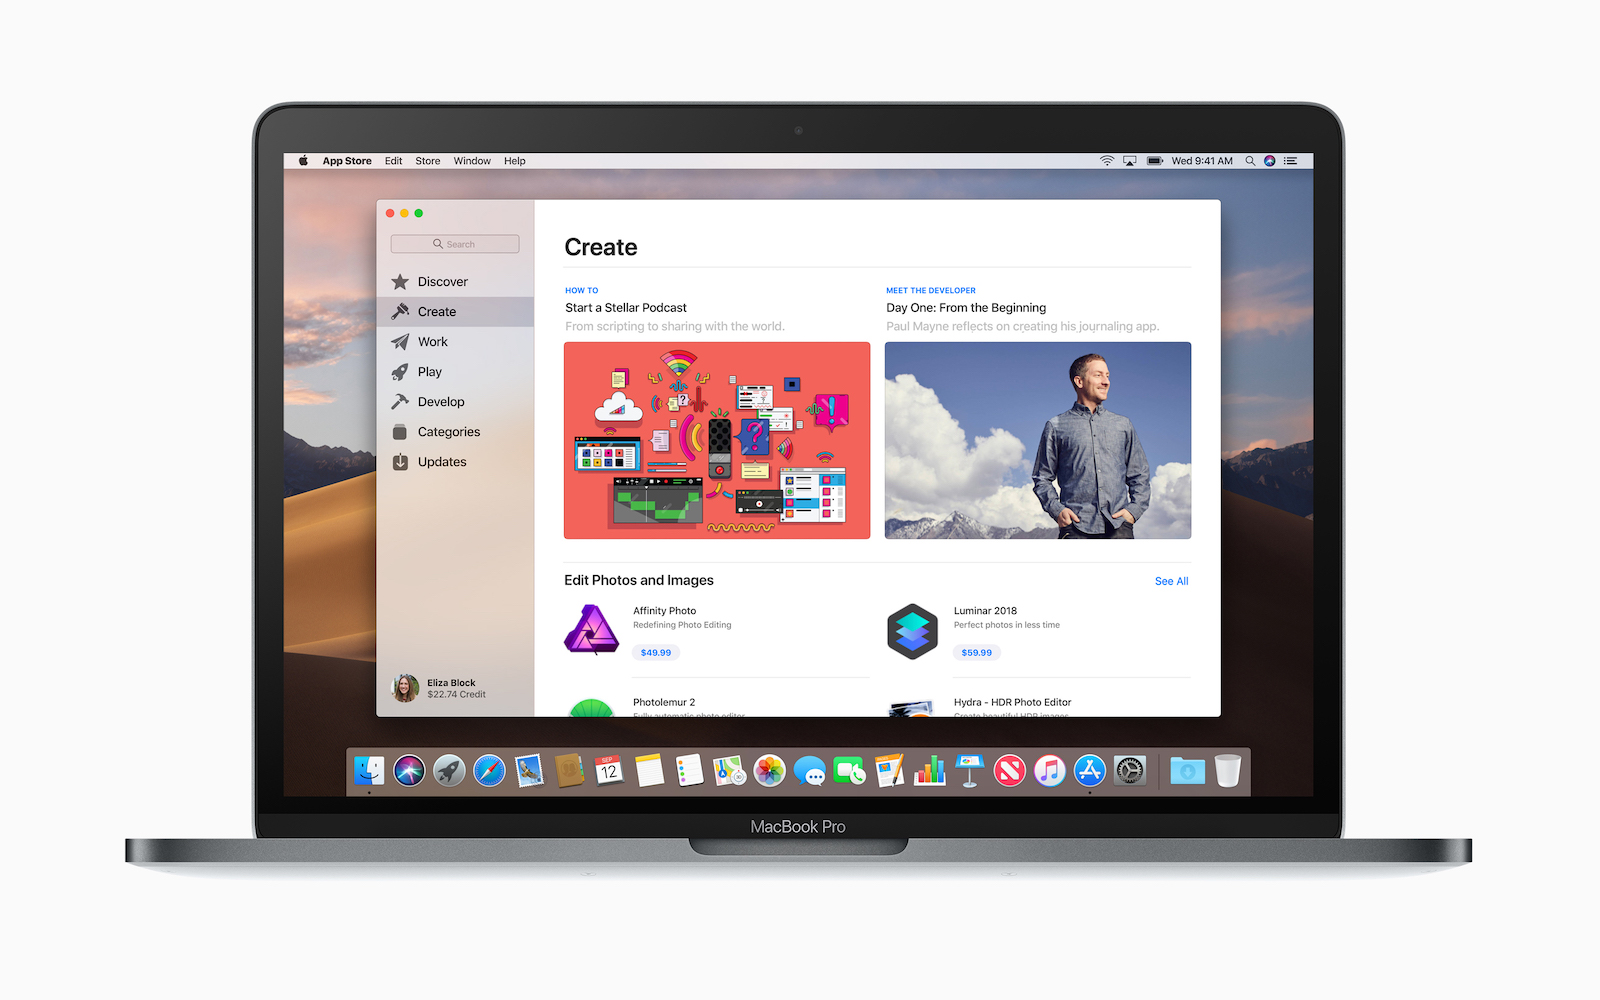 MacOS Mojave App Store iMac Pro screen 09242018